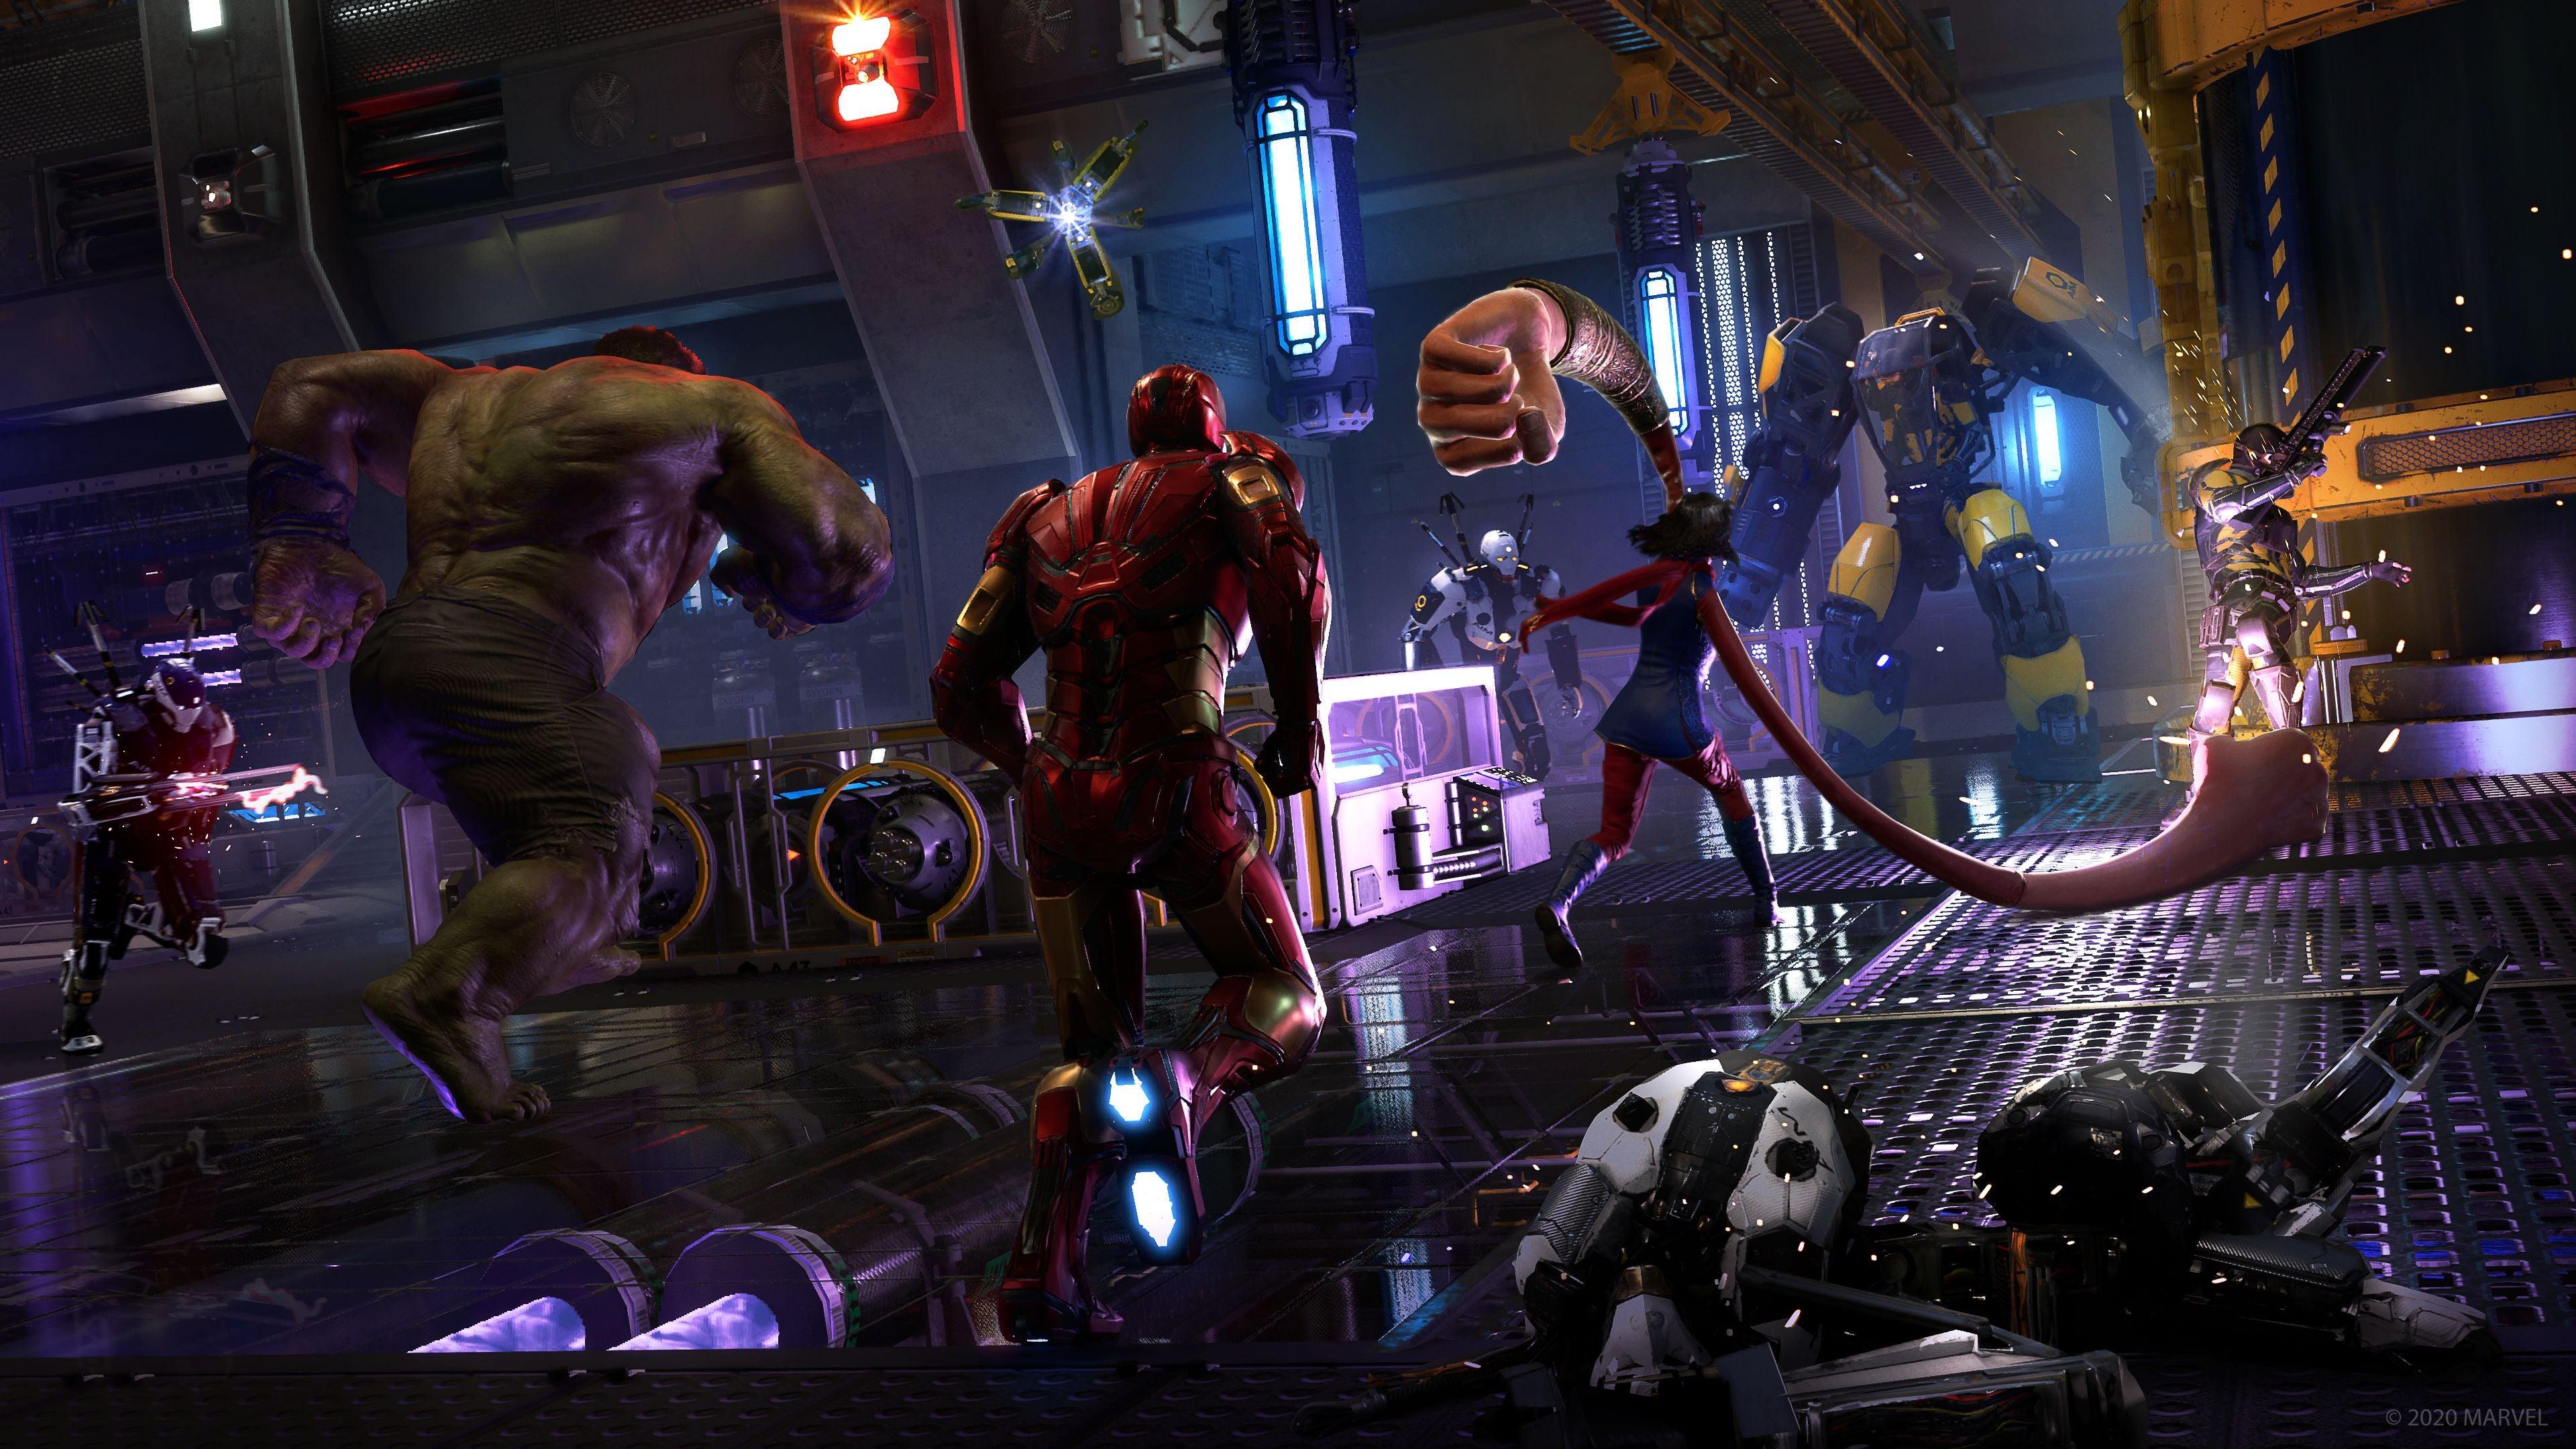 Hulk, Iron Man & Kamala Khan with enlarged fists battle Synthoids & a Exo Skeleton.